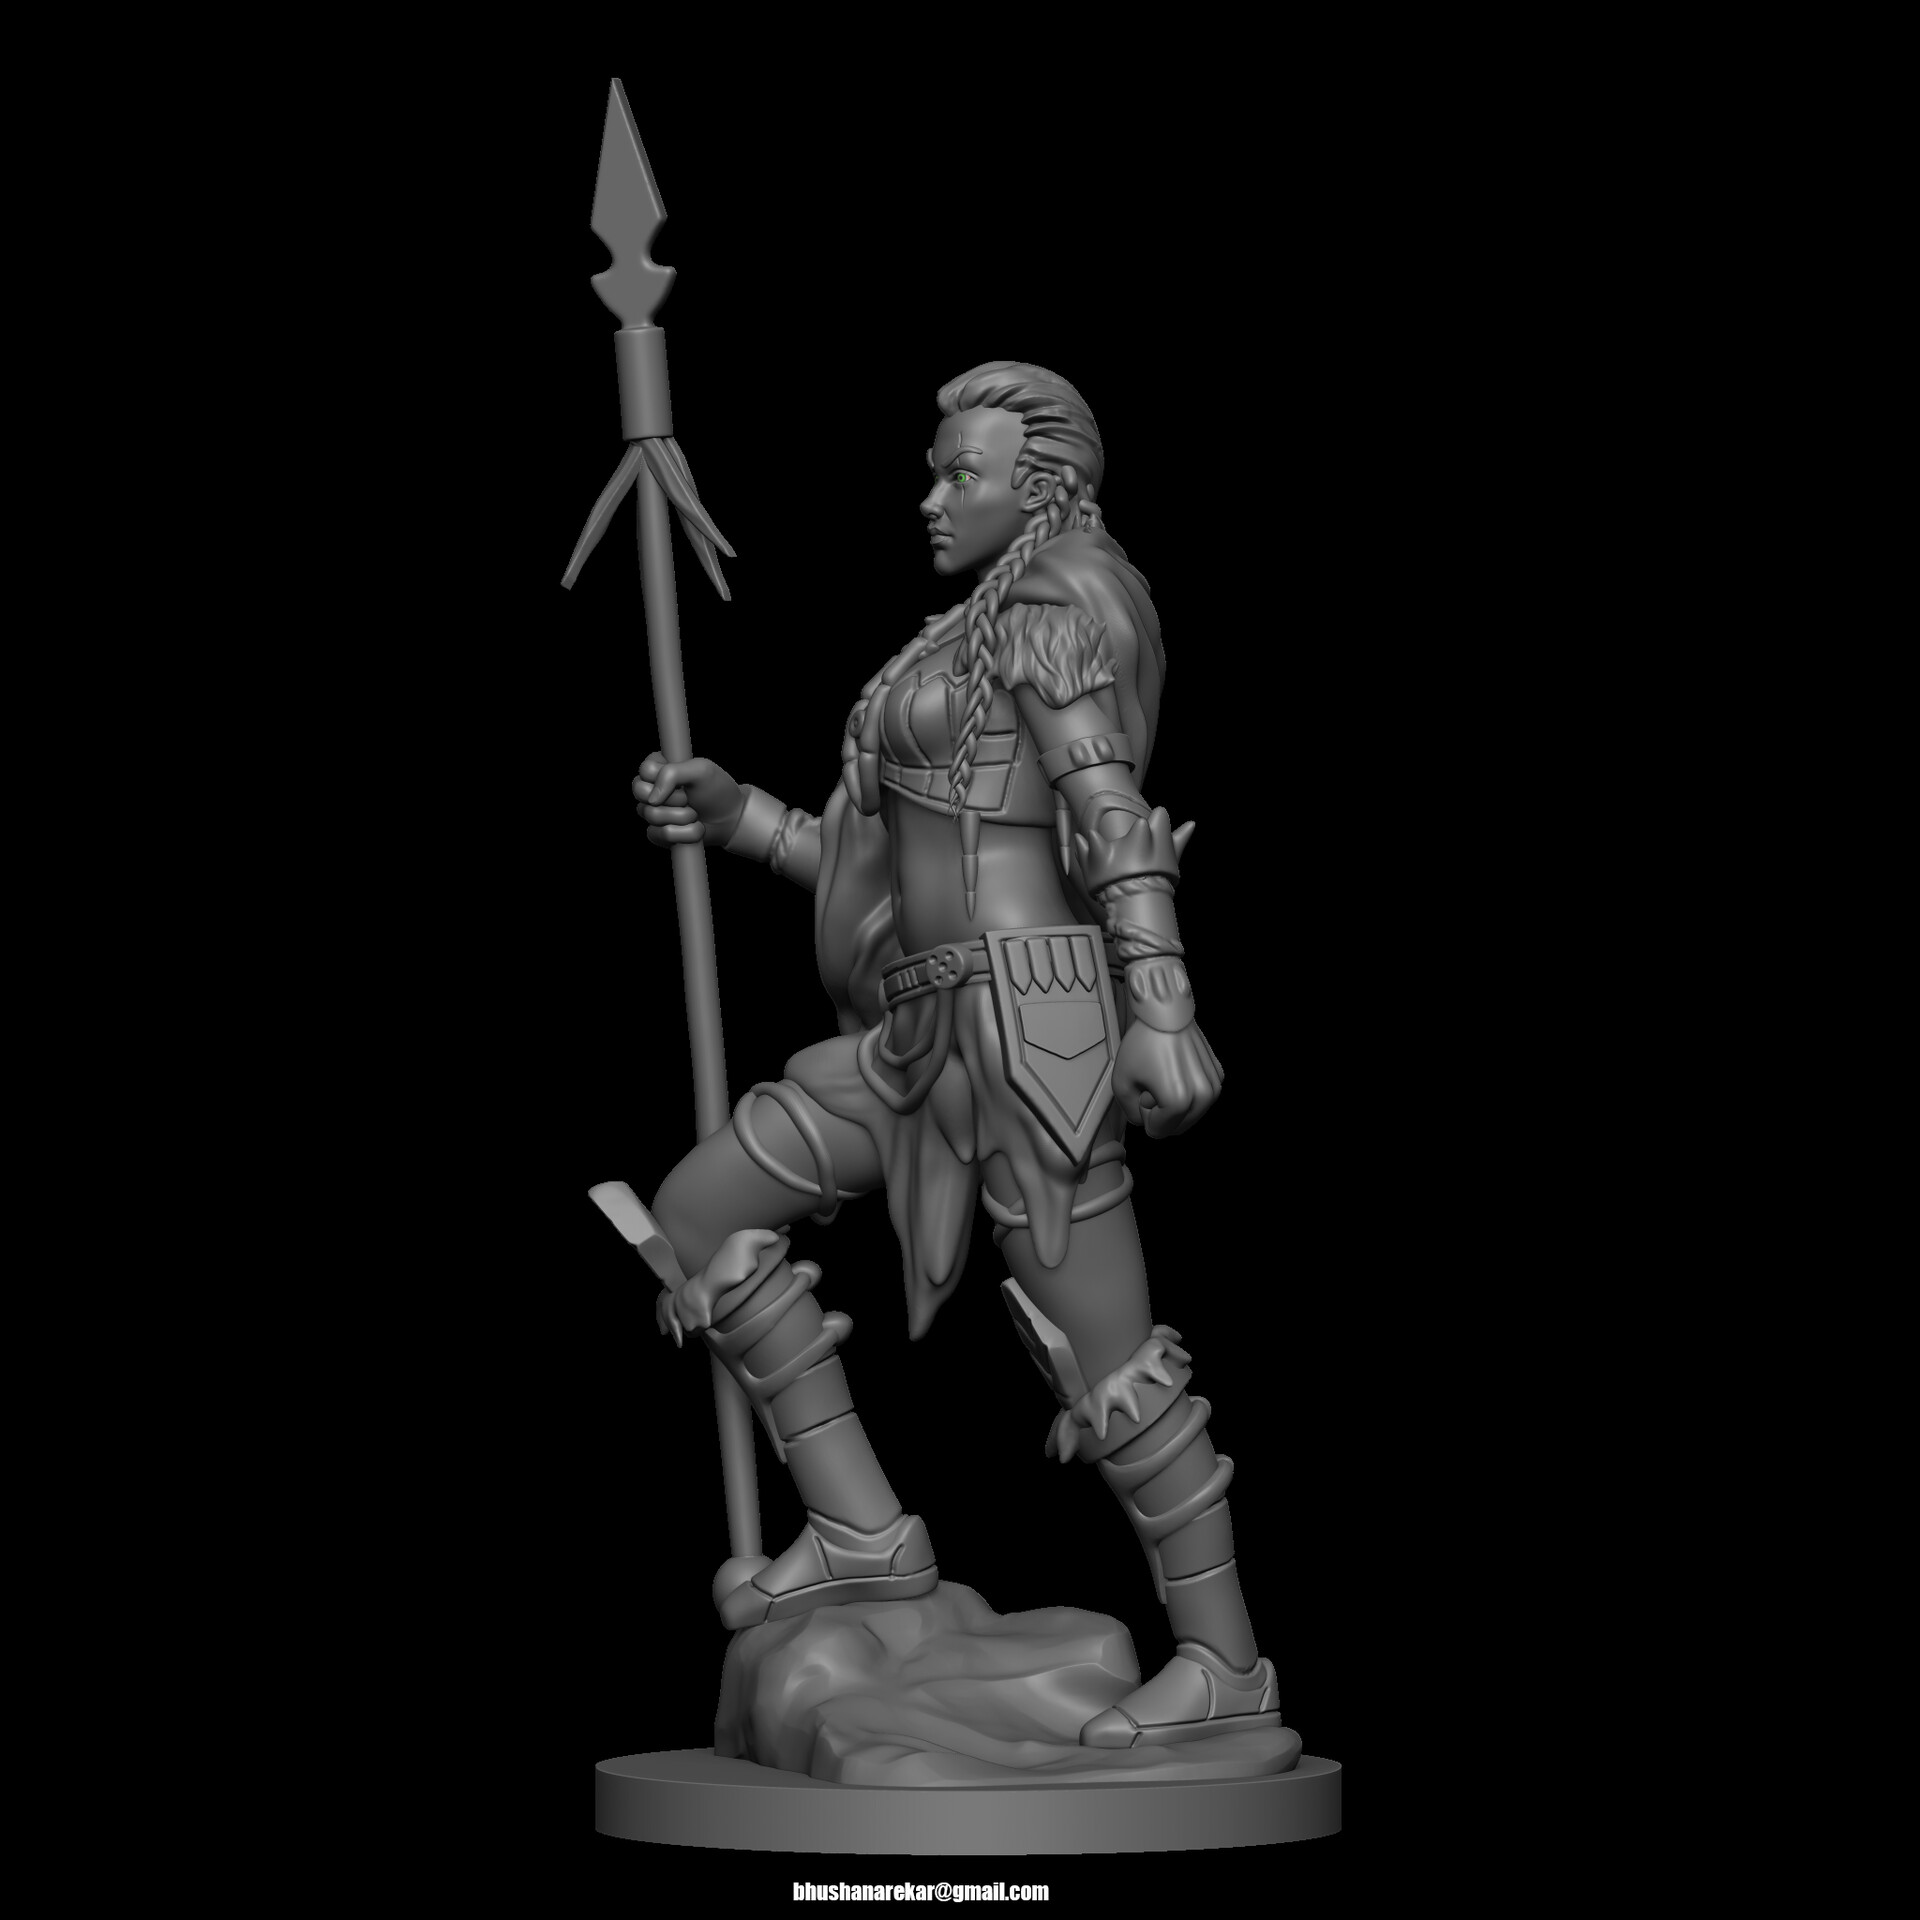 Bhushan arekar amazon warrior 2